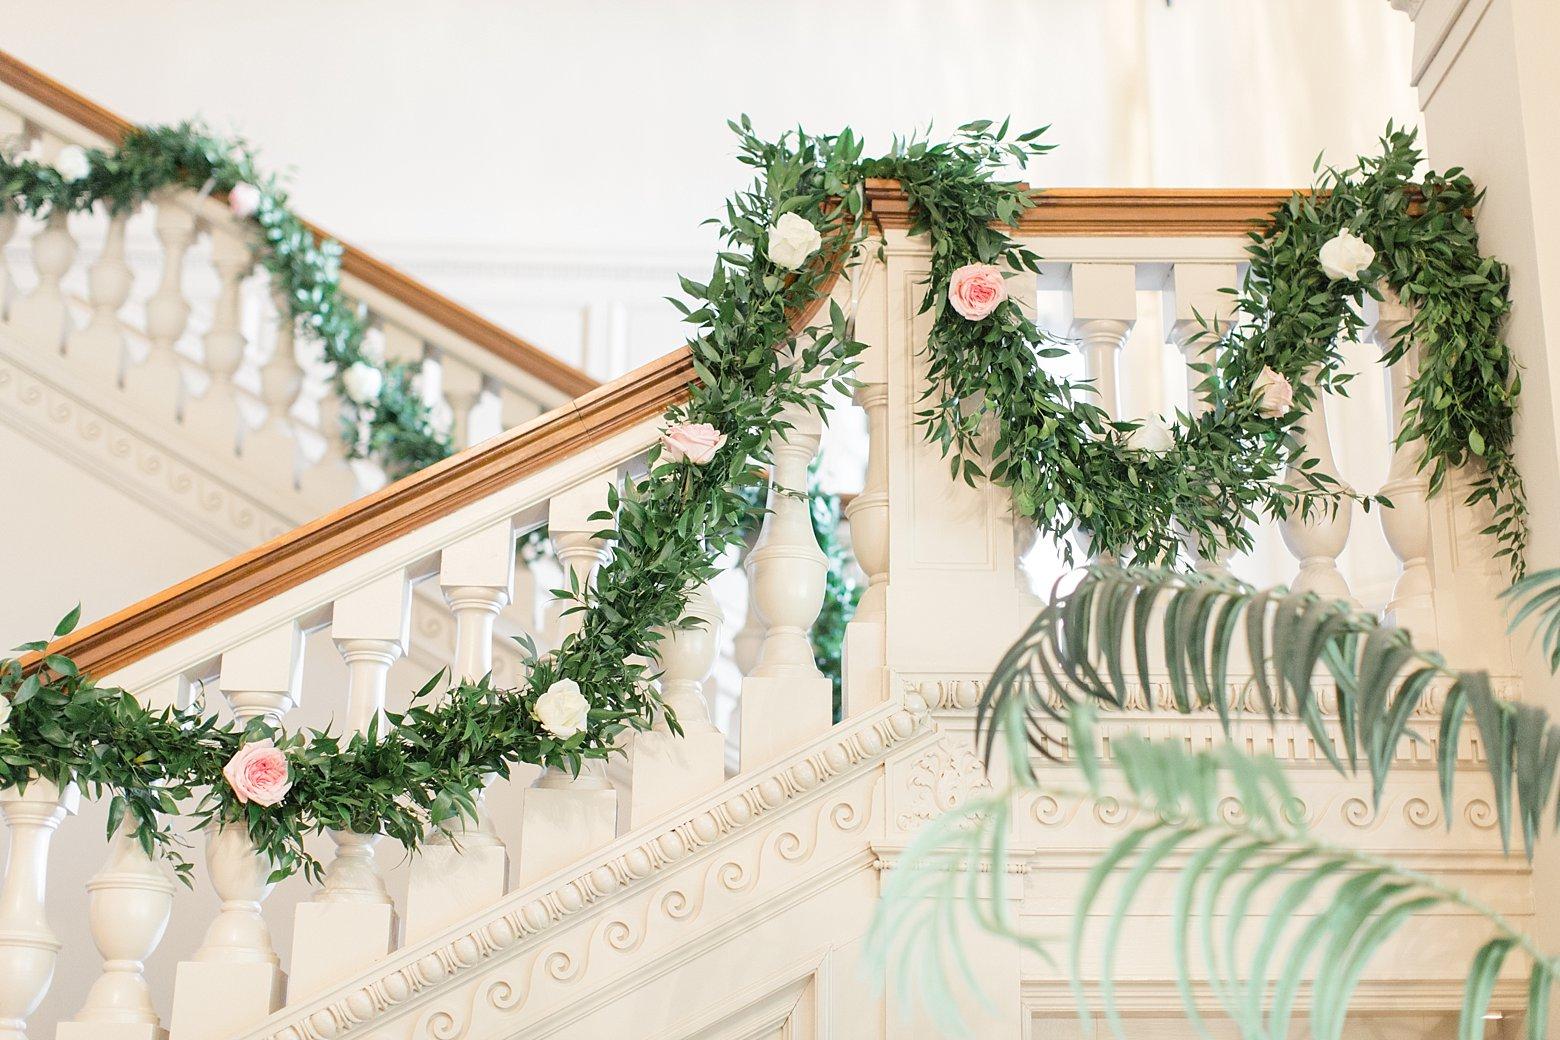 lauren_fair_photography_april_lynn_designs_stasia_matt_spring_cairnwood_estate_wedding_northeast_philadelphia_blush_pink_gold_wedding_invitation_stationery_0137